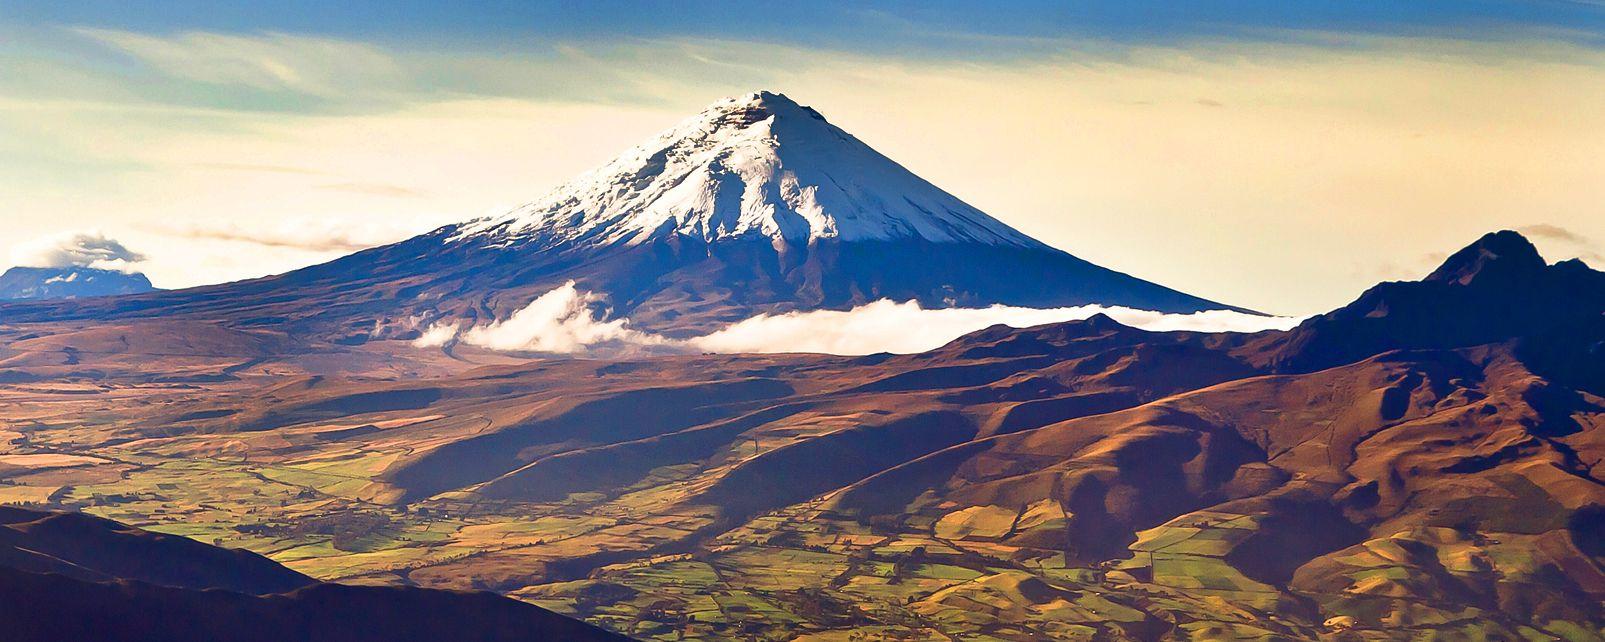 volcan-equateur